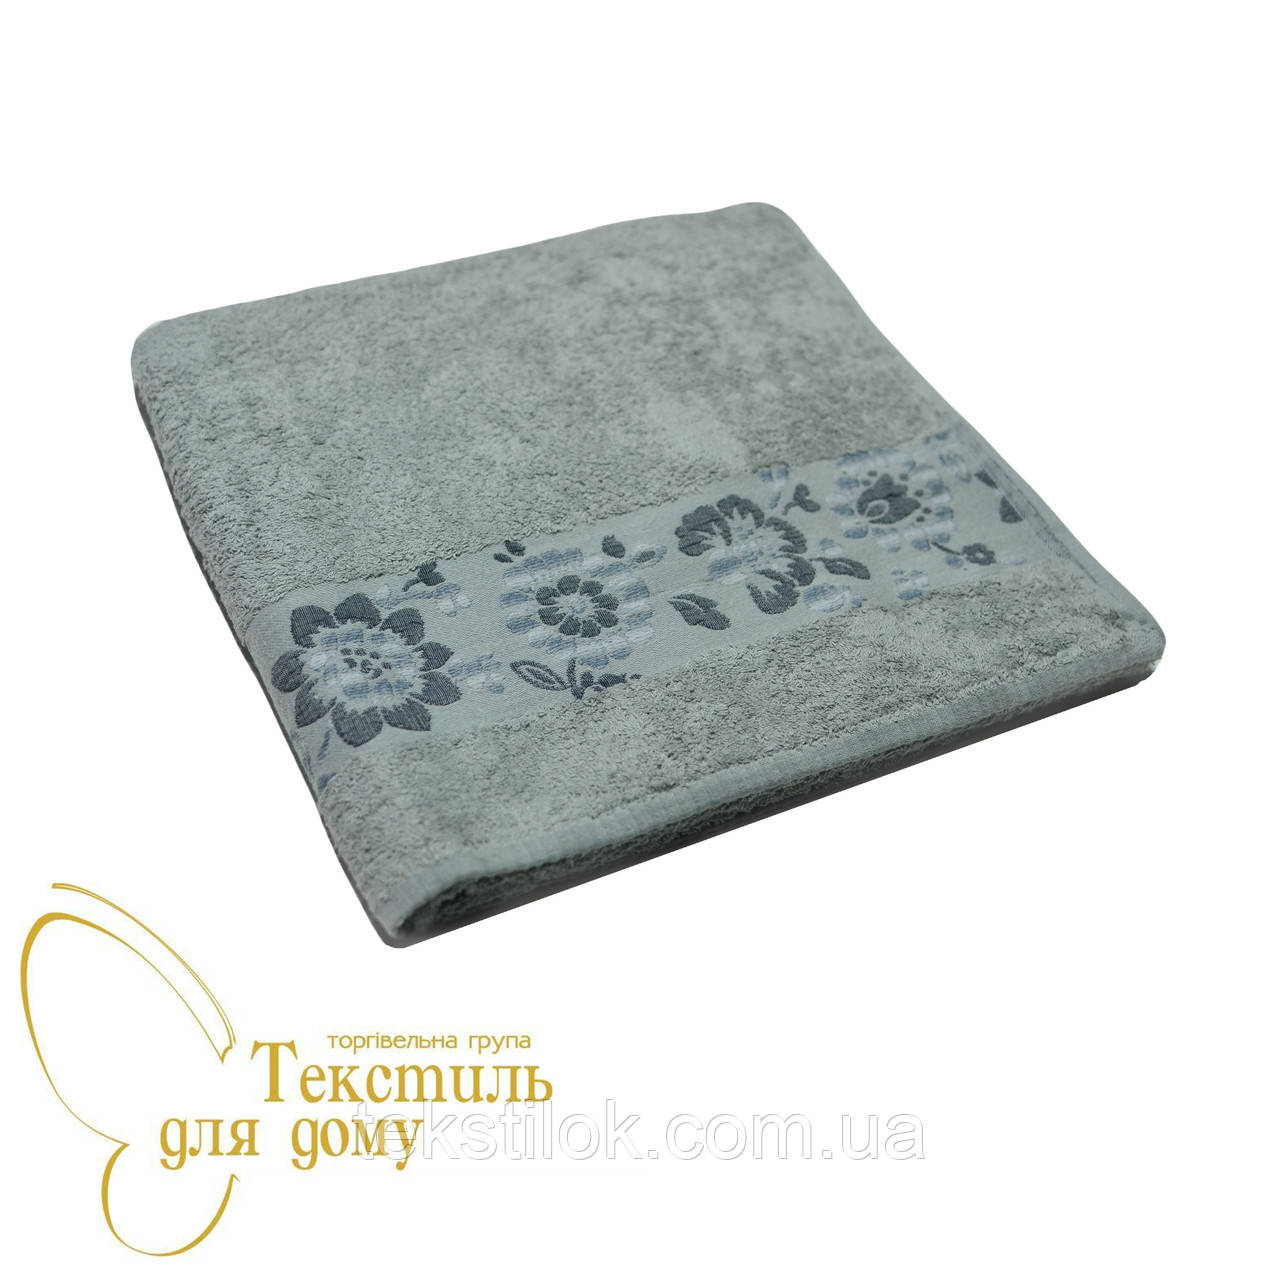 Полотенце банное 70*140, серый